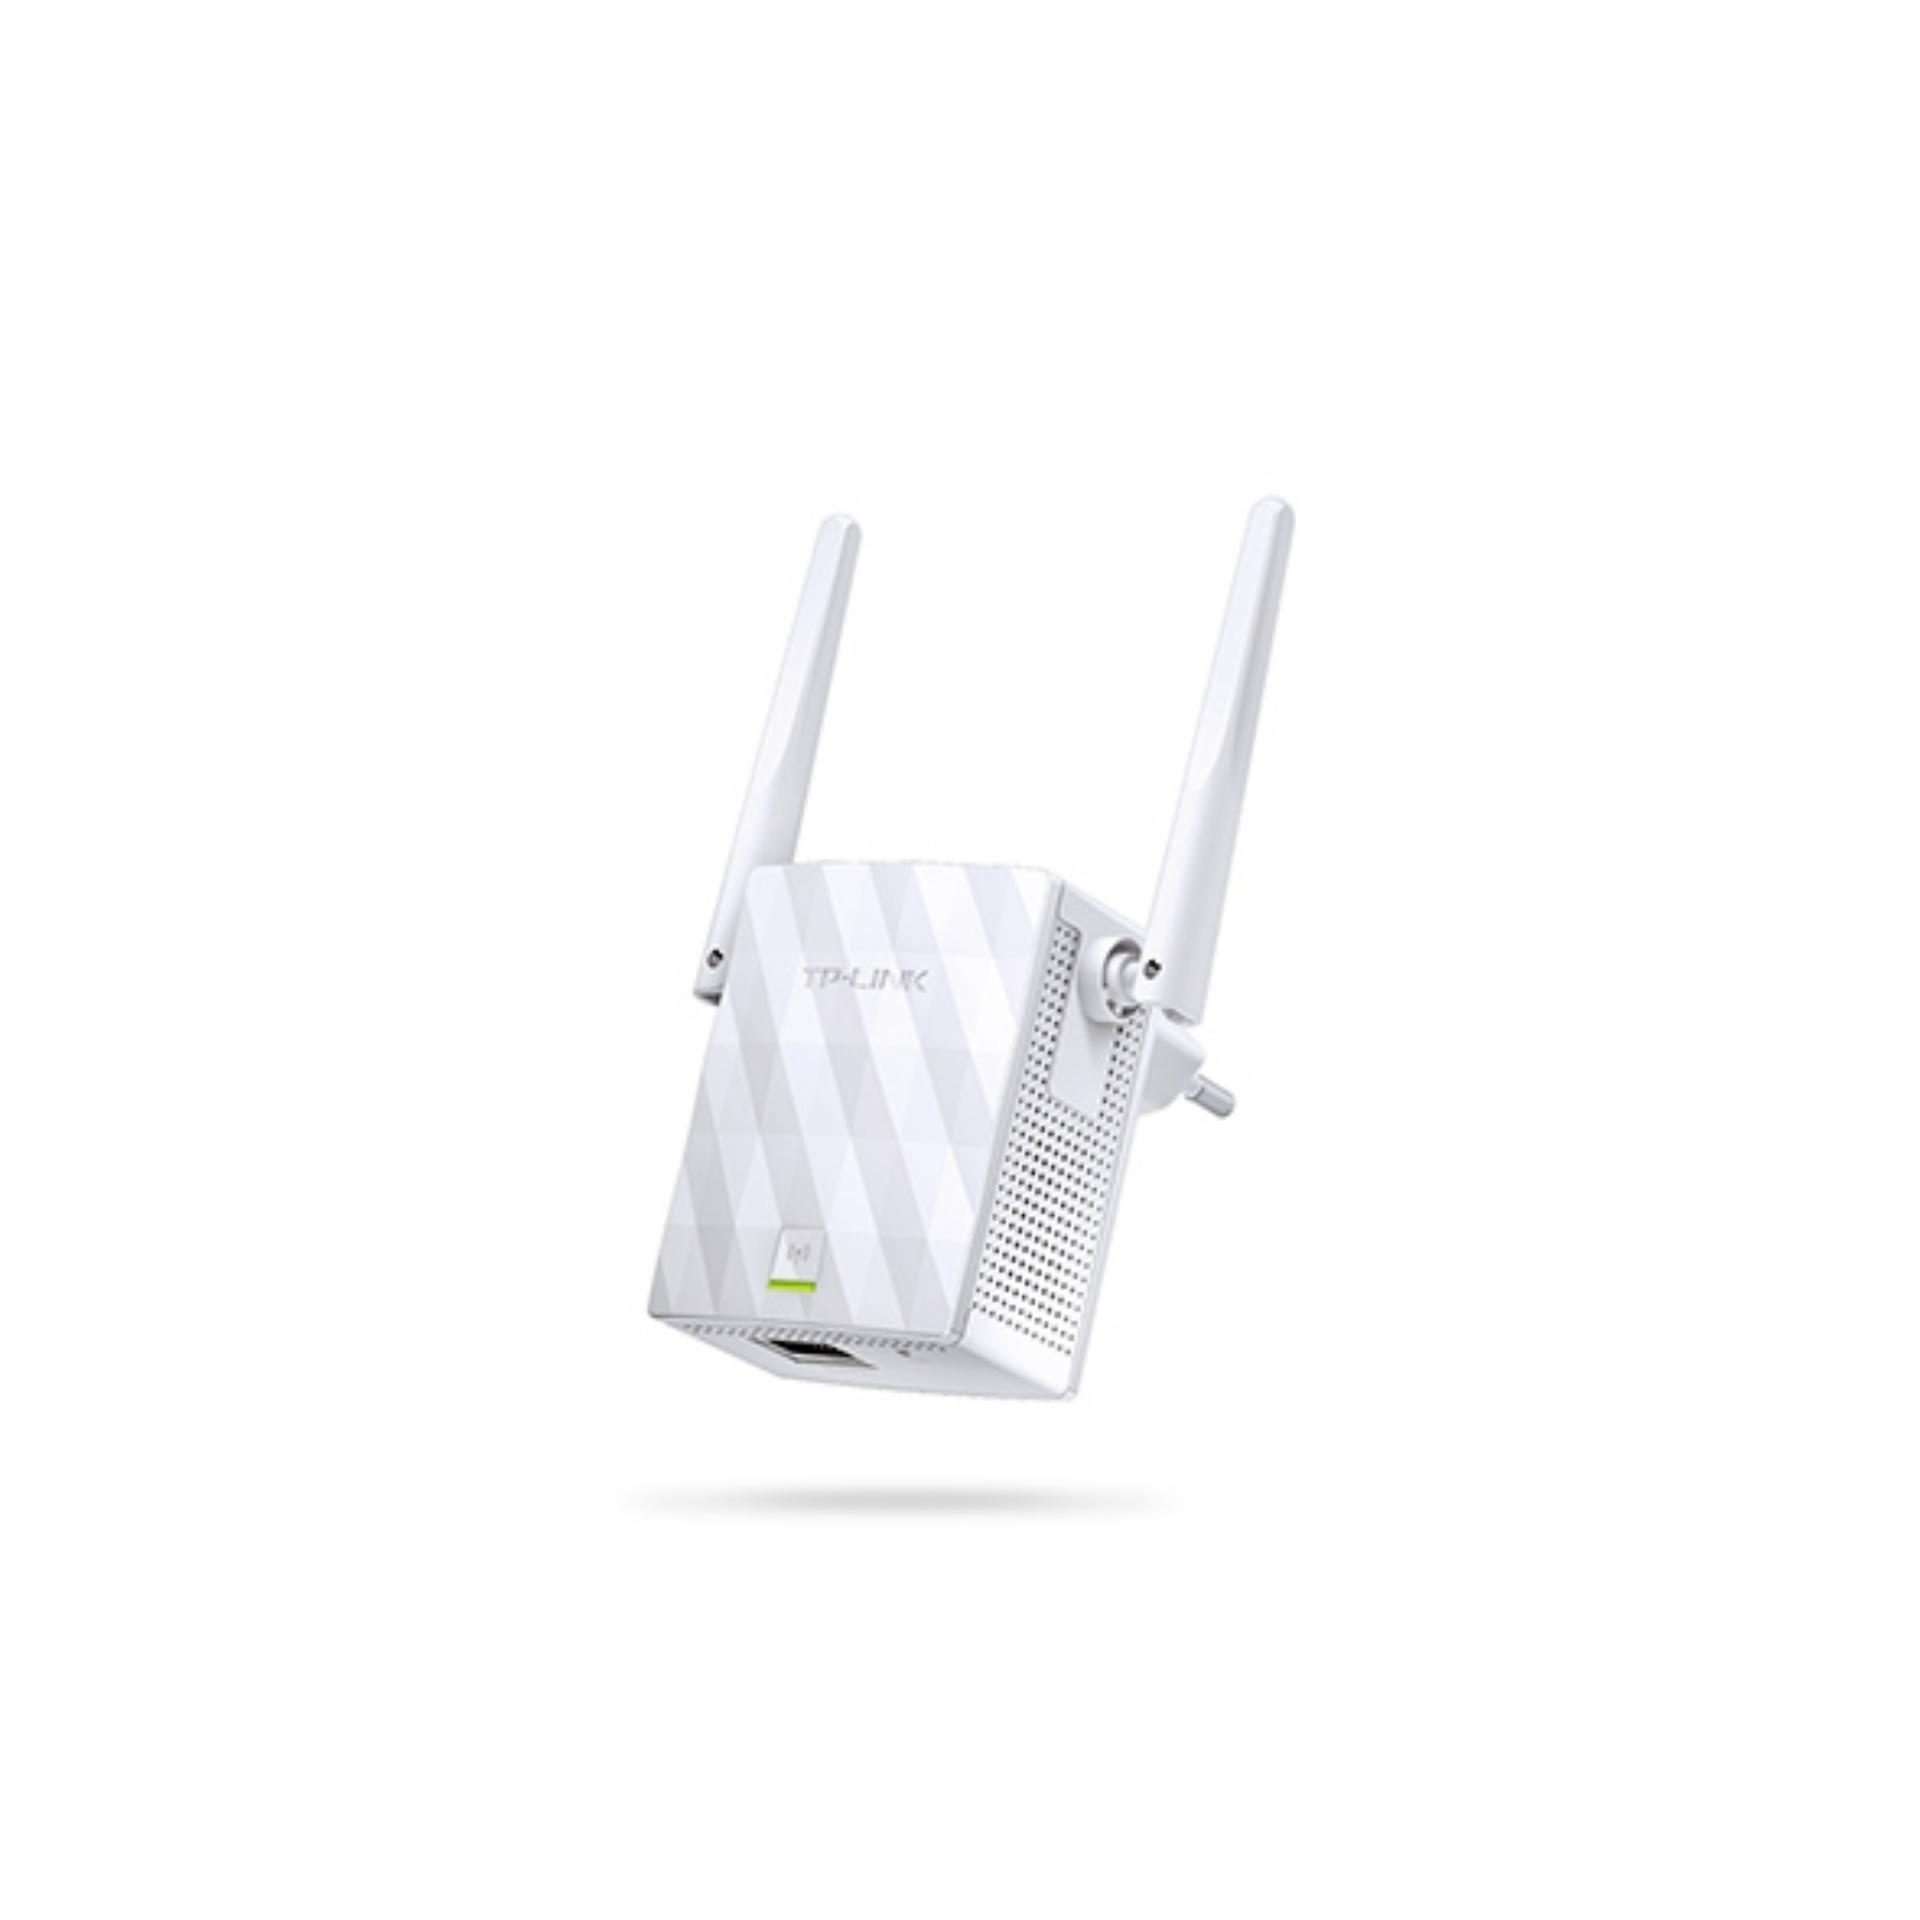 Beli Tl Wa855Re 300Mbps Wi Fi Range Extender Kredit Indonesia